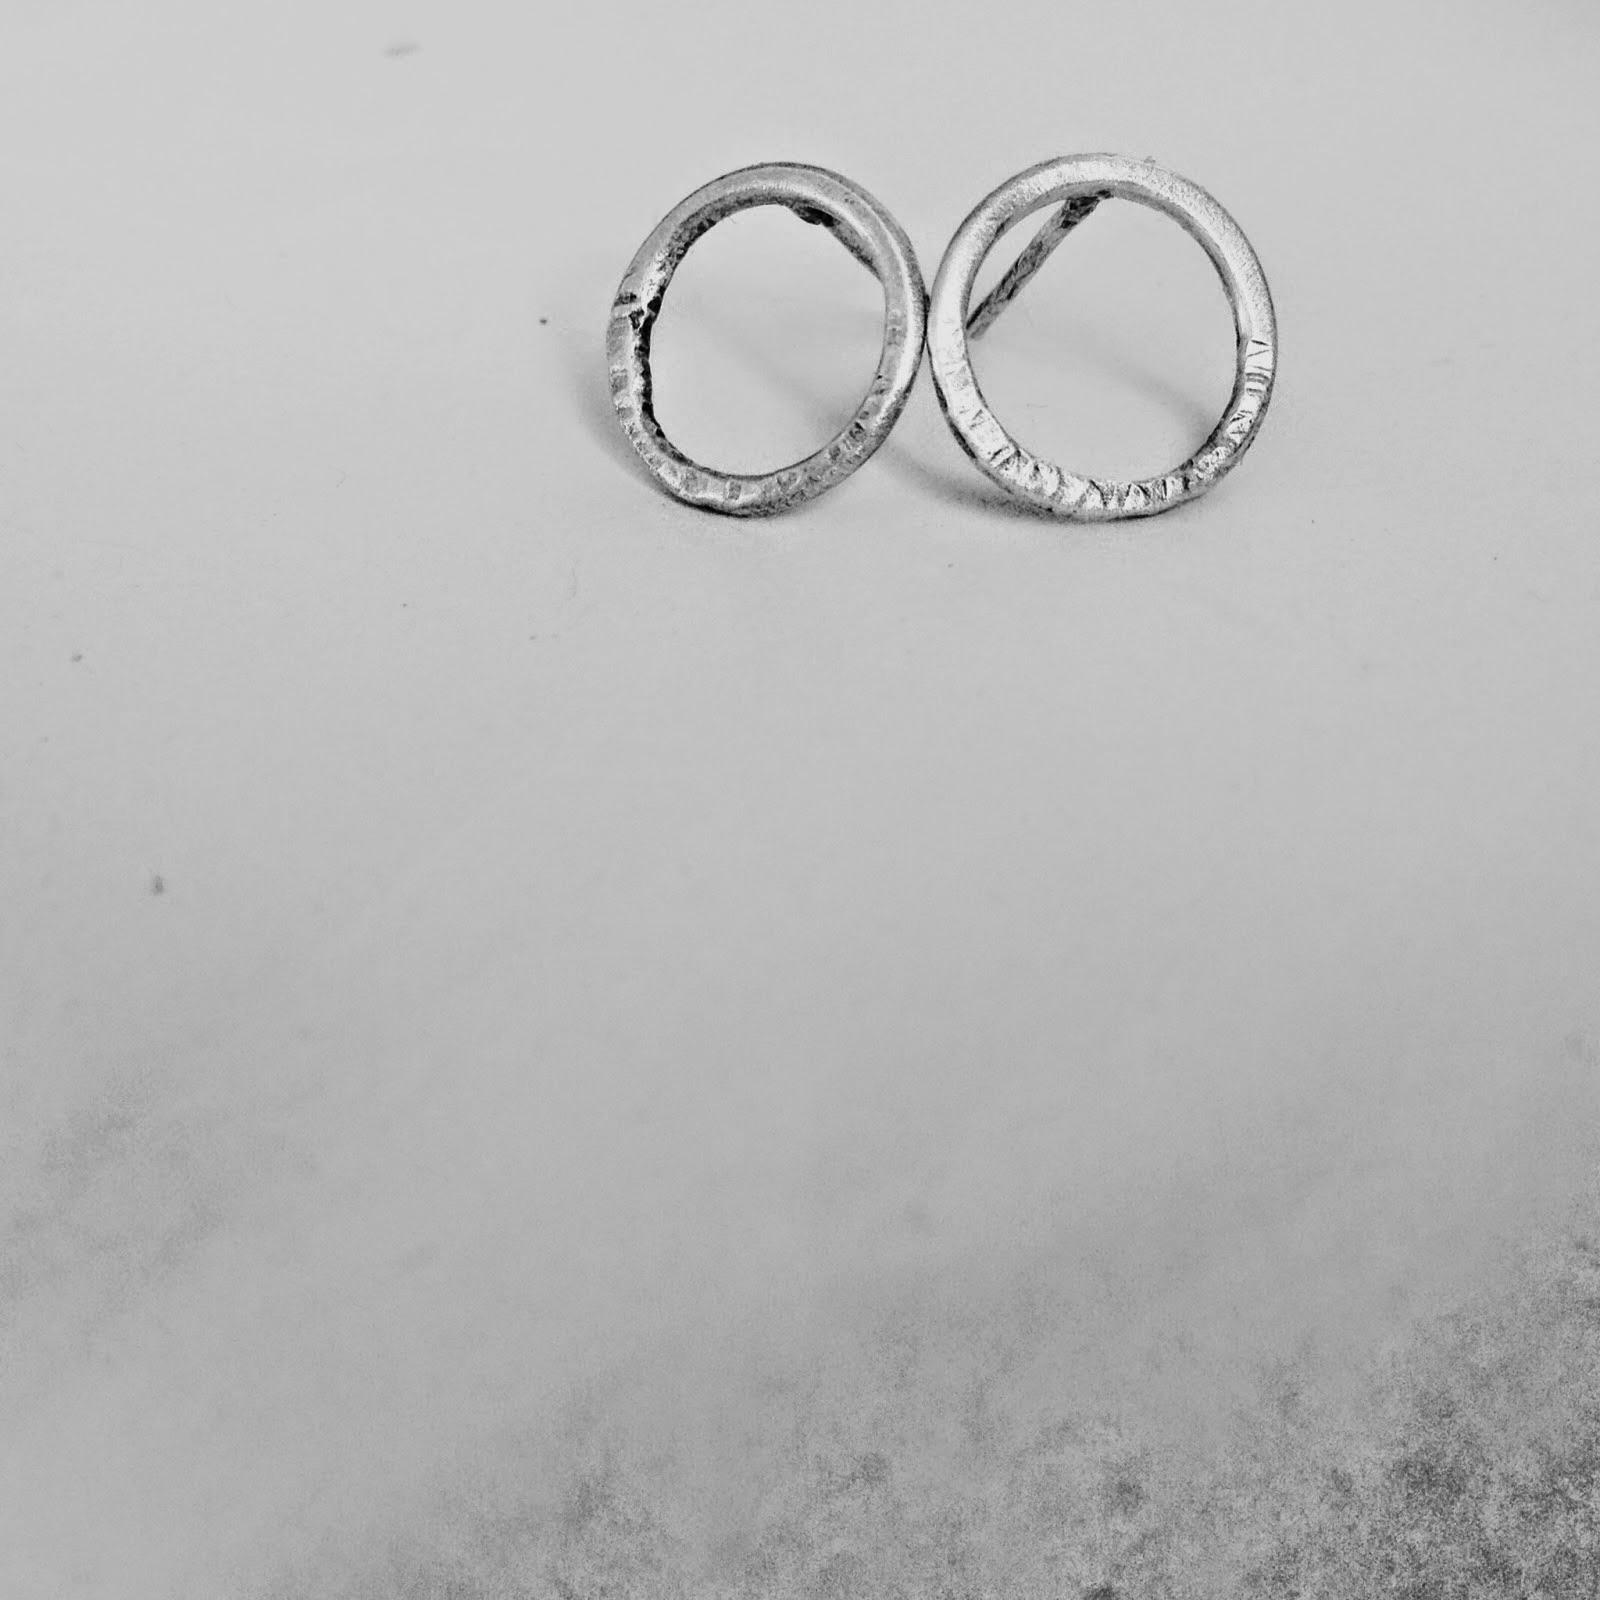 http://shapingmetal.blogspot.it/2014/10/minimal-orecchini-small-in-argento.html